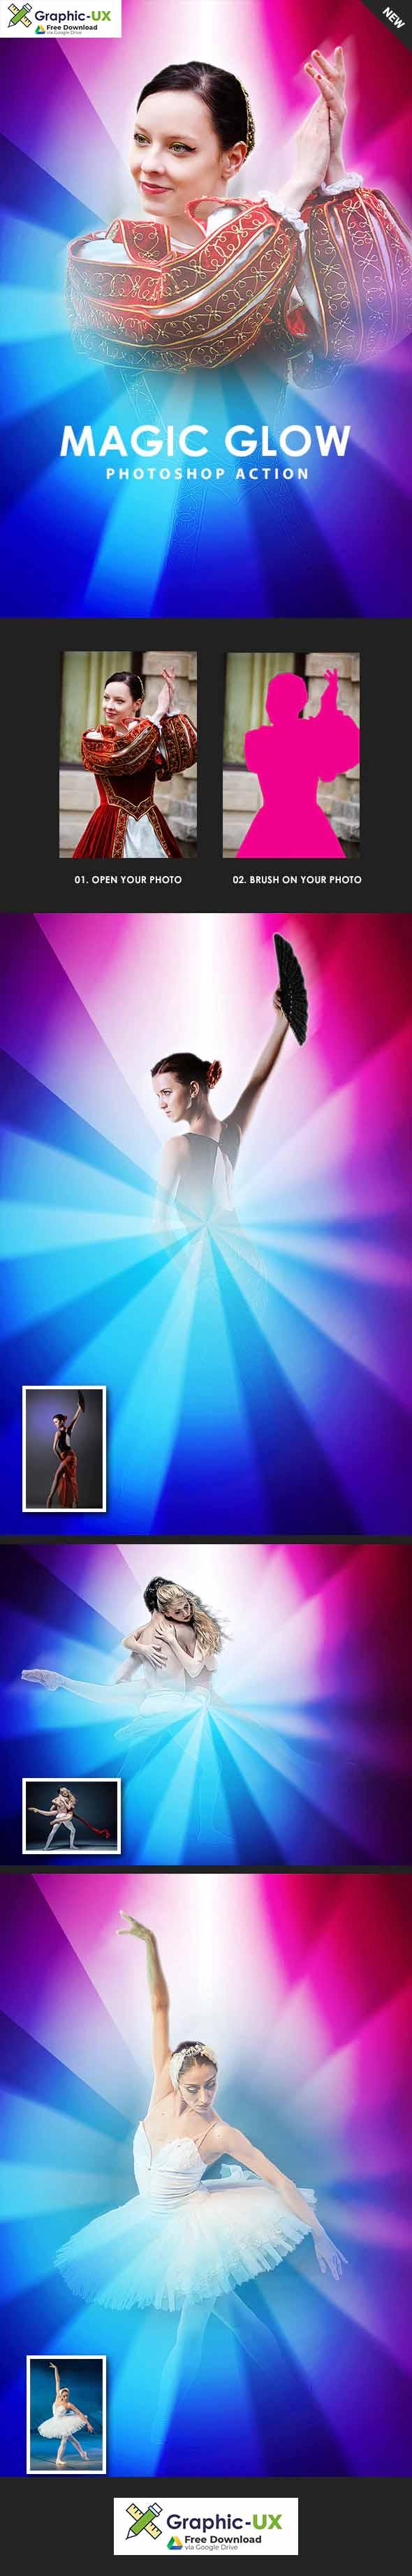 Magic Glow Photoshop Action